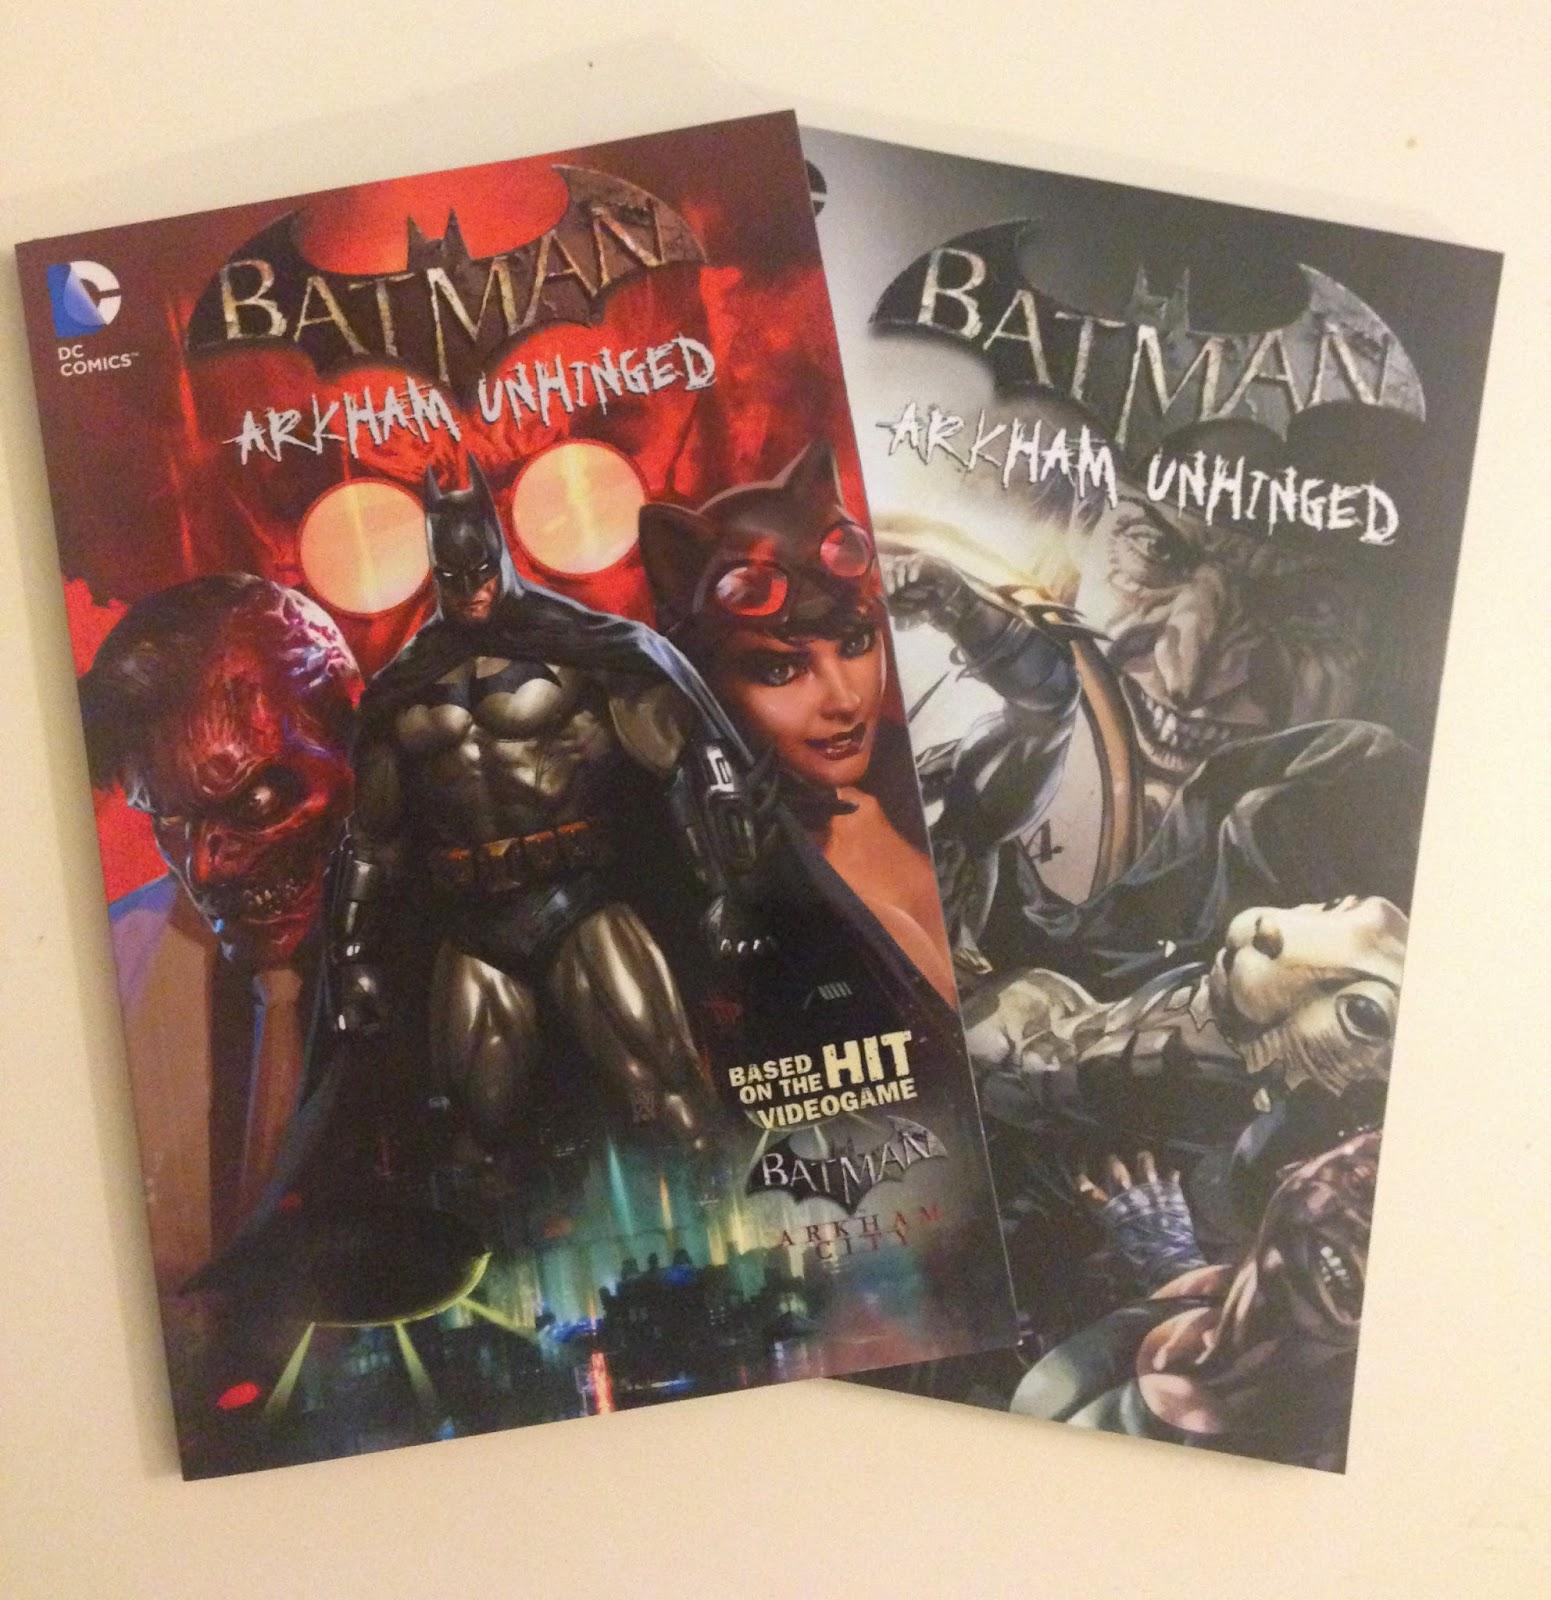 batman gotham arkham comic book